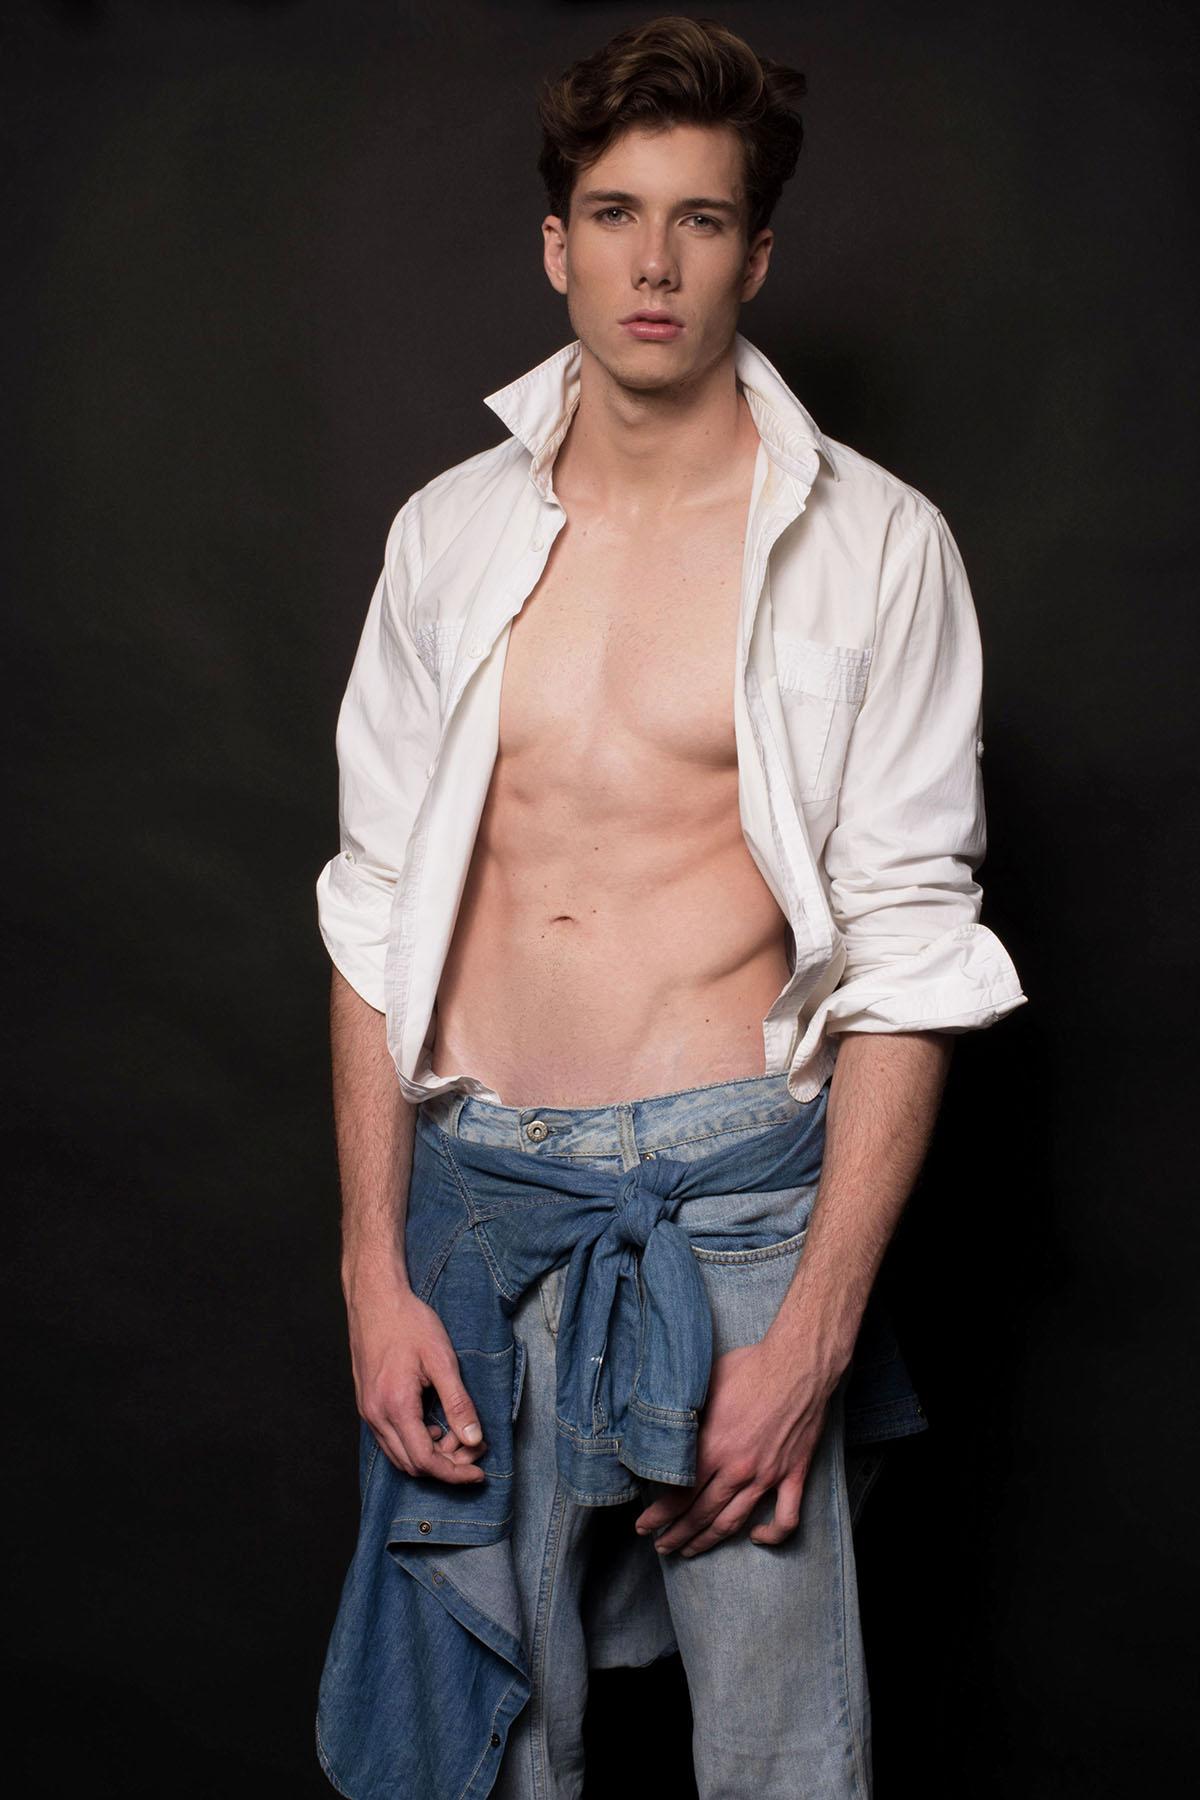 Matheus Stenico by De Macedo for Brazilian Male Model